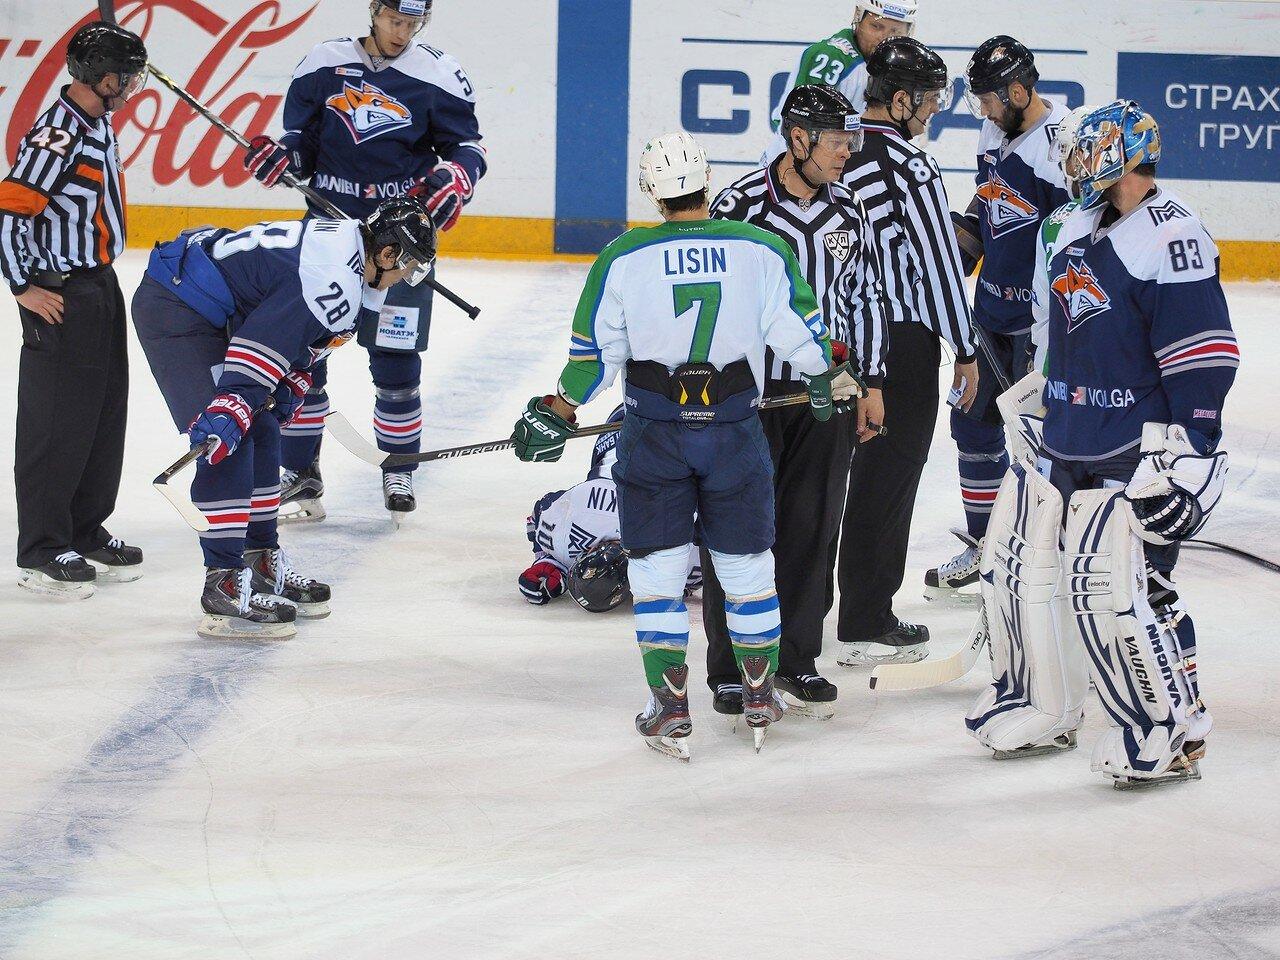 106Плей-офф 2016 Восток Финал Металлург - Салават Юлаев 23.03.2016